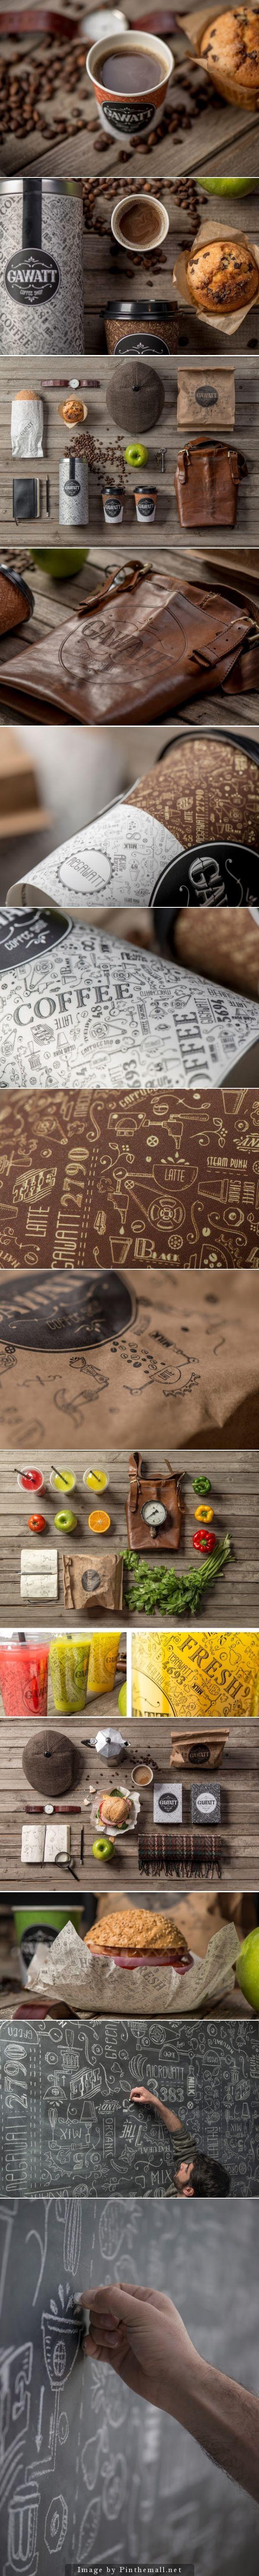 Gawatt Take-out Coffee-shop Agency: Backbone branding Art director: Stepan Azaryan Designer: Karen Gevorgyan, Illustartor: Armenak Grigoryan Client: Gawatt Country: Armenia